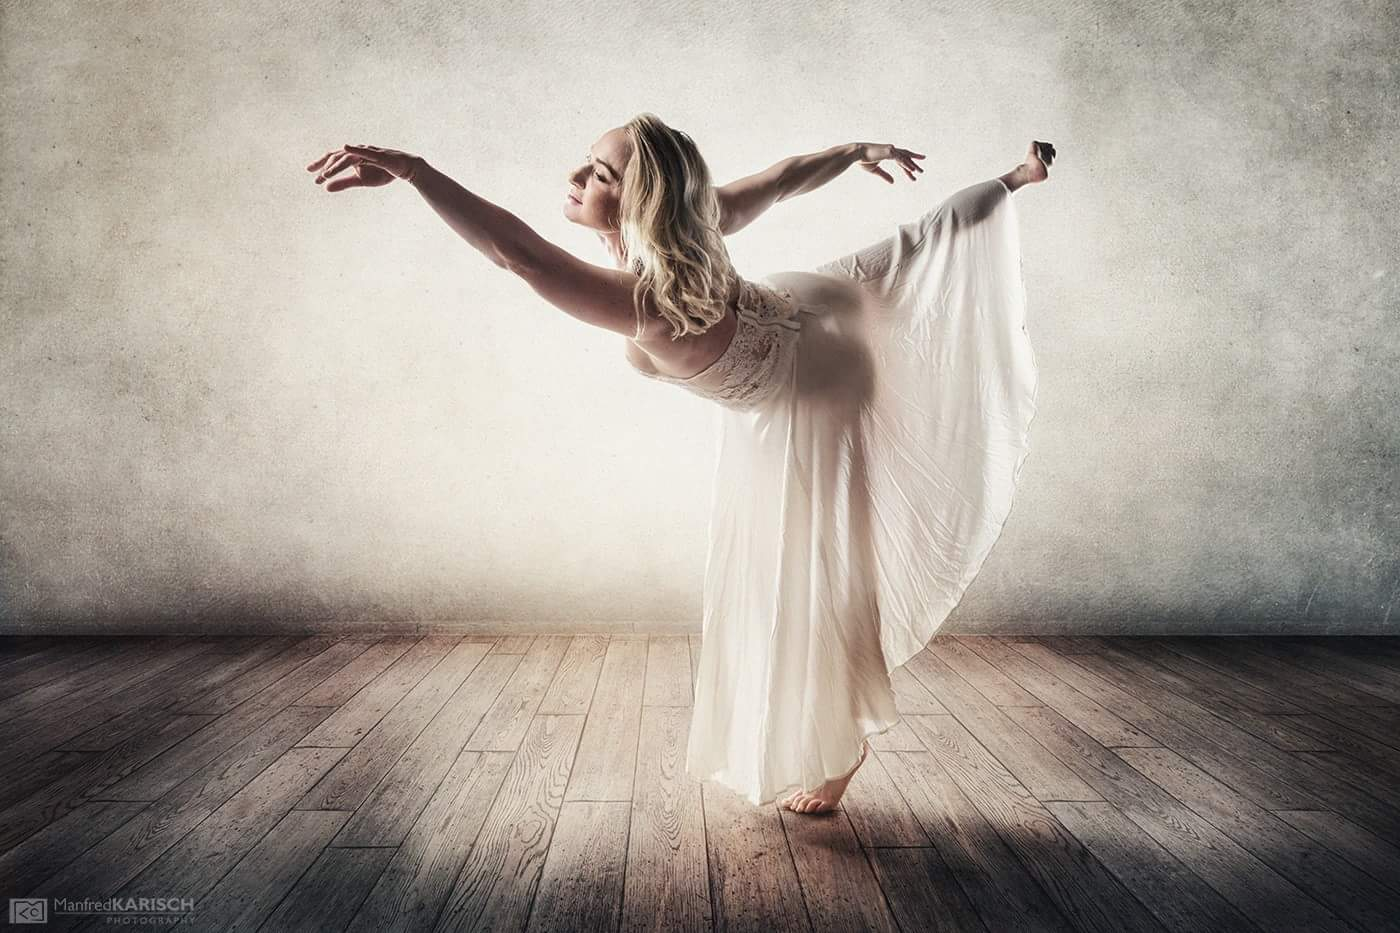 Sachi Cote dancer